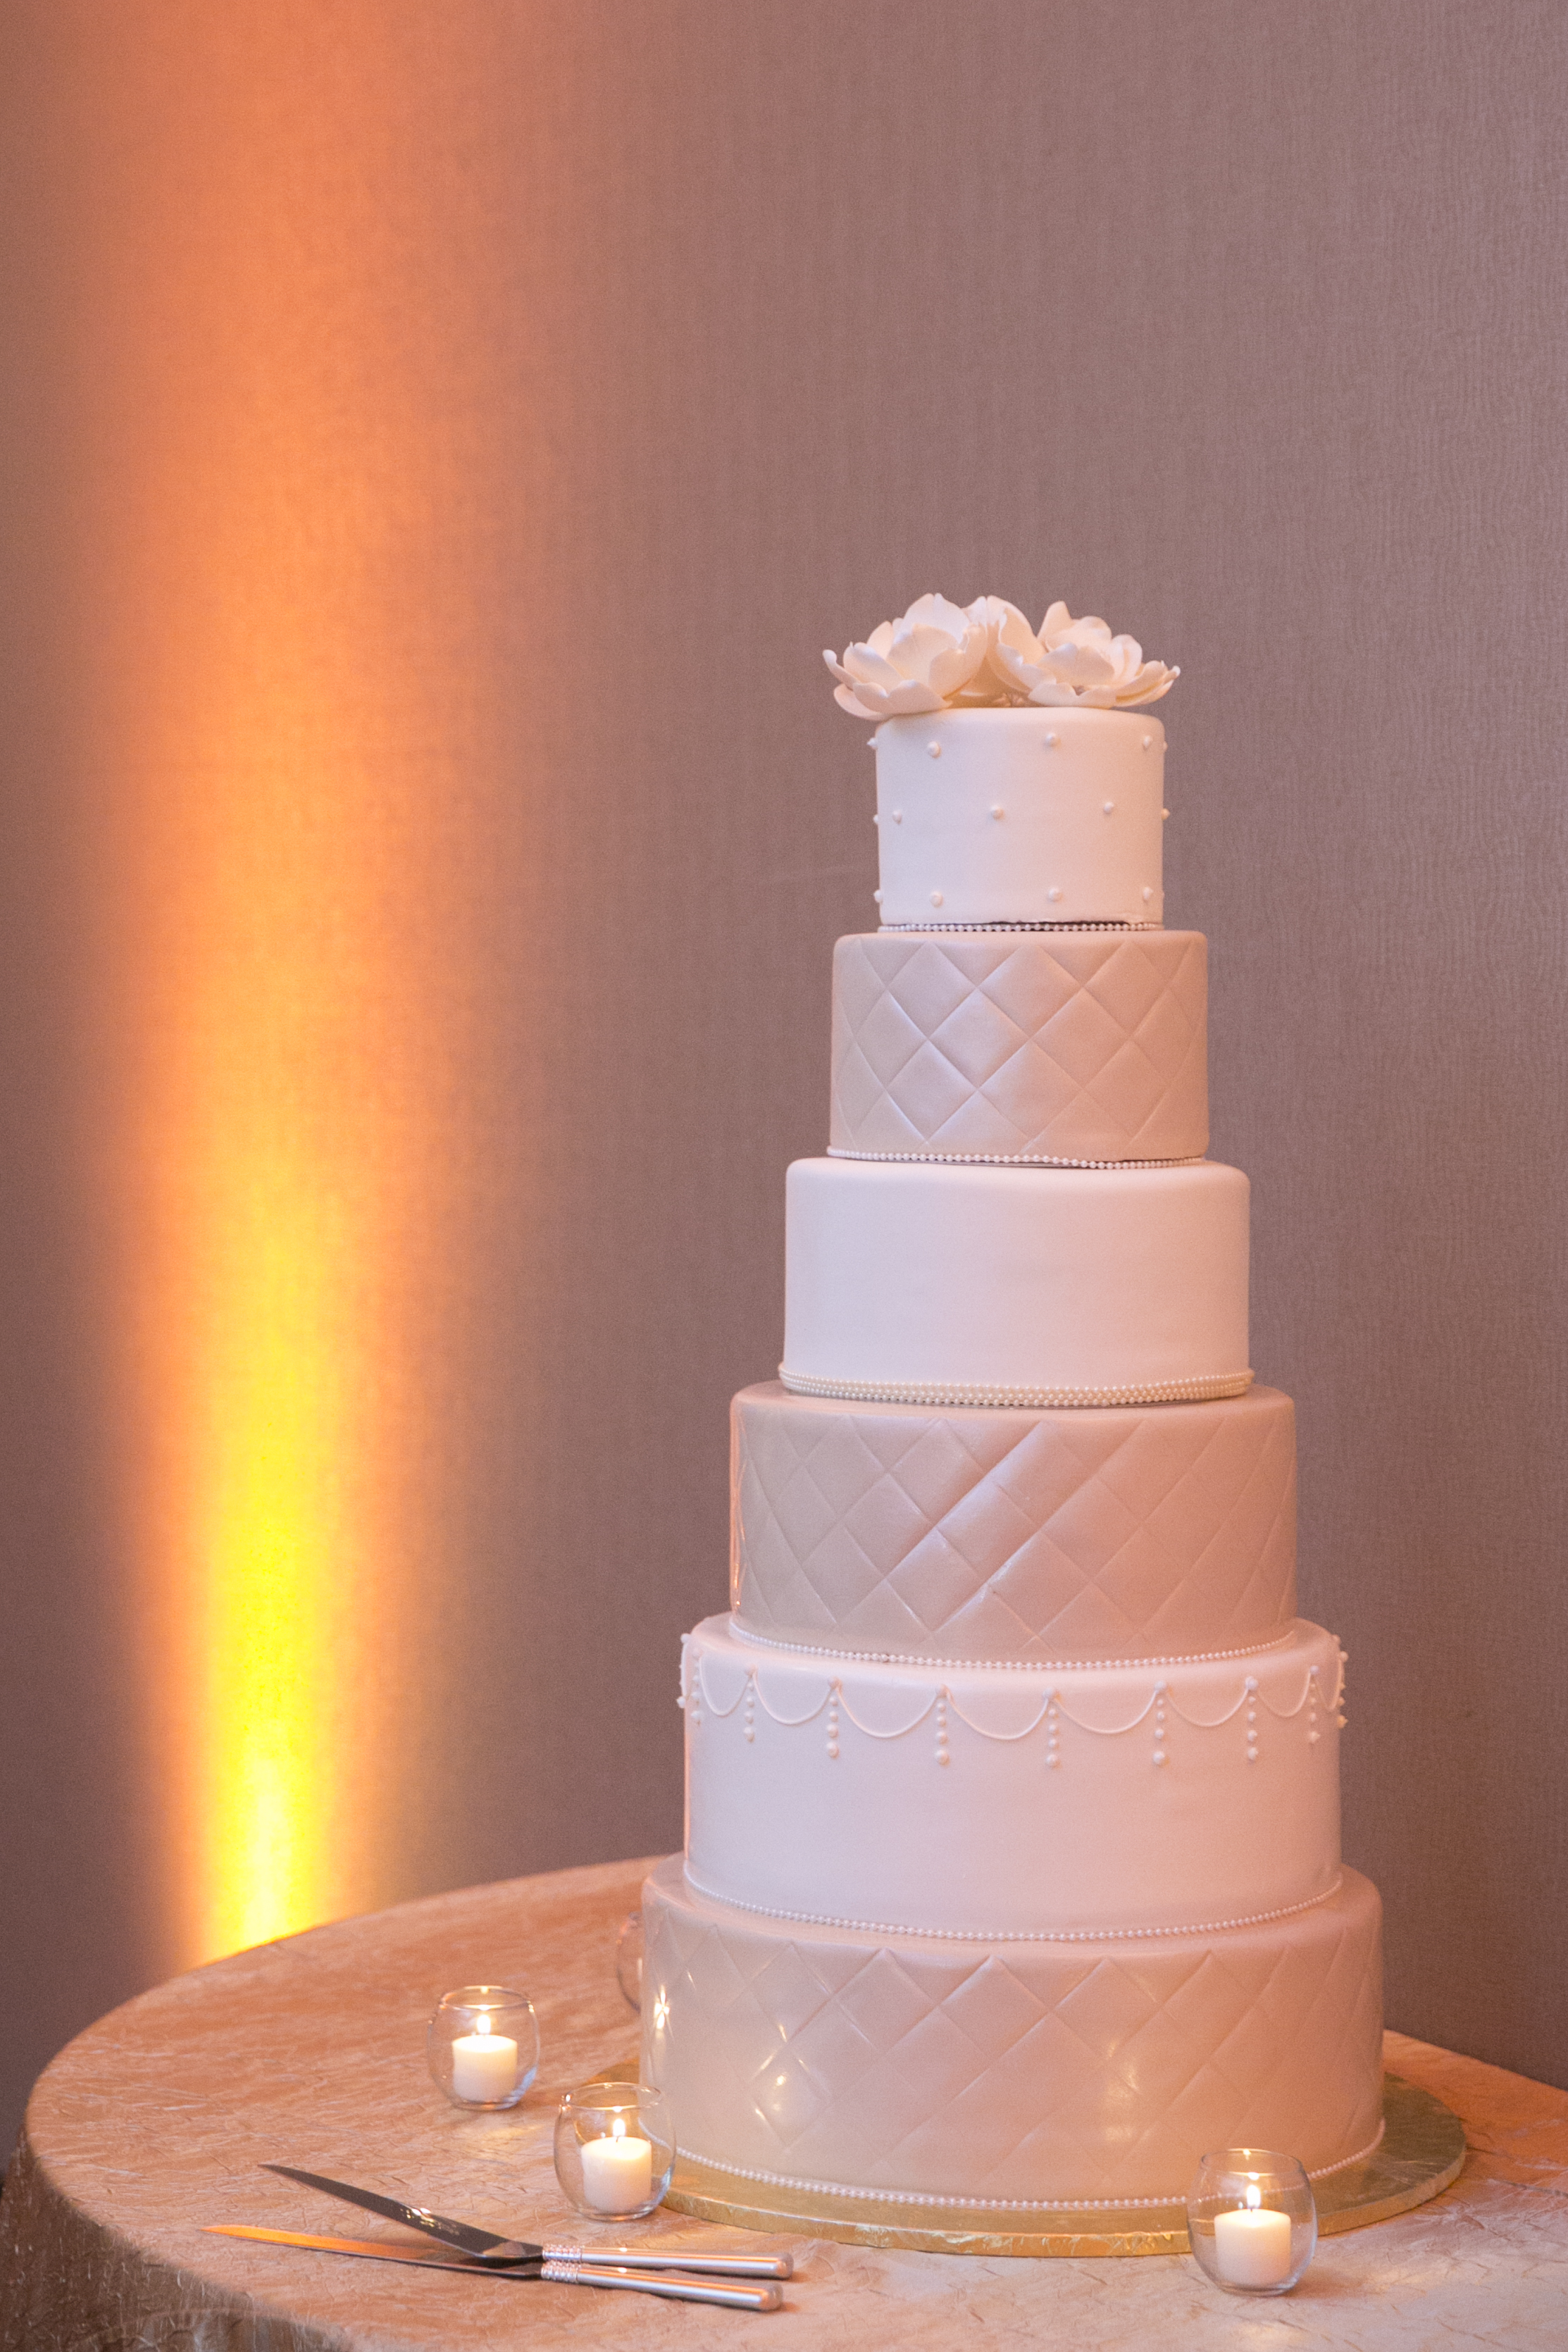 Persian Wedding-South San Francisco-Meo Baaklini30.jpg